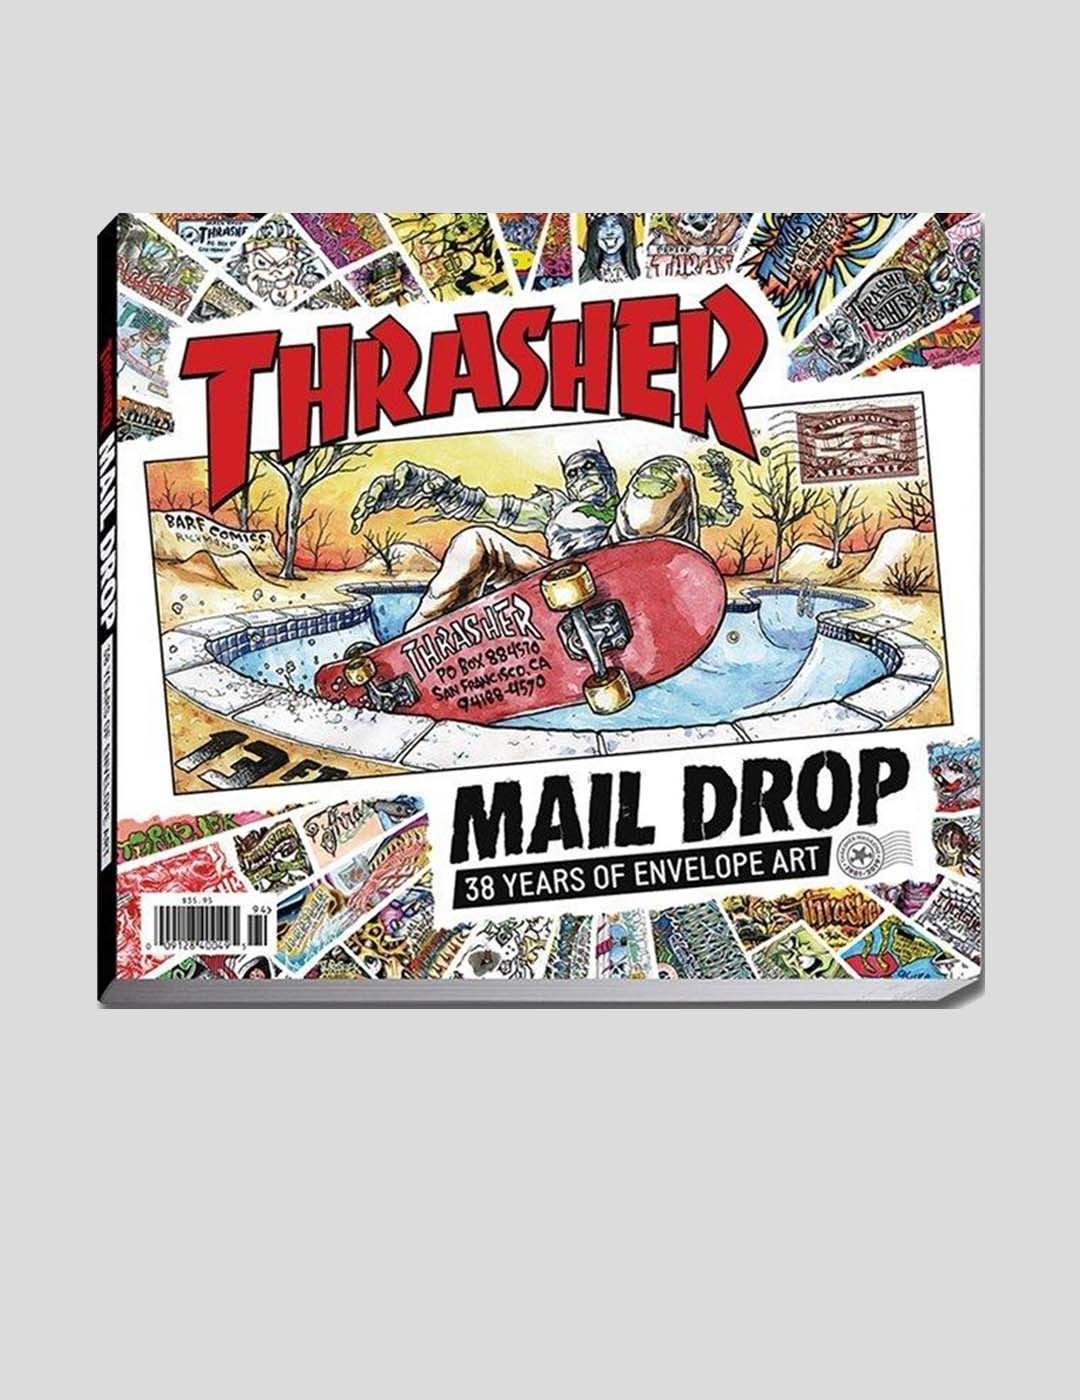 LIBRO THRASHER THRASHER MAIL DROP BOOK